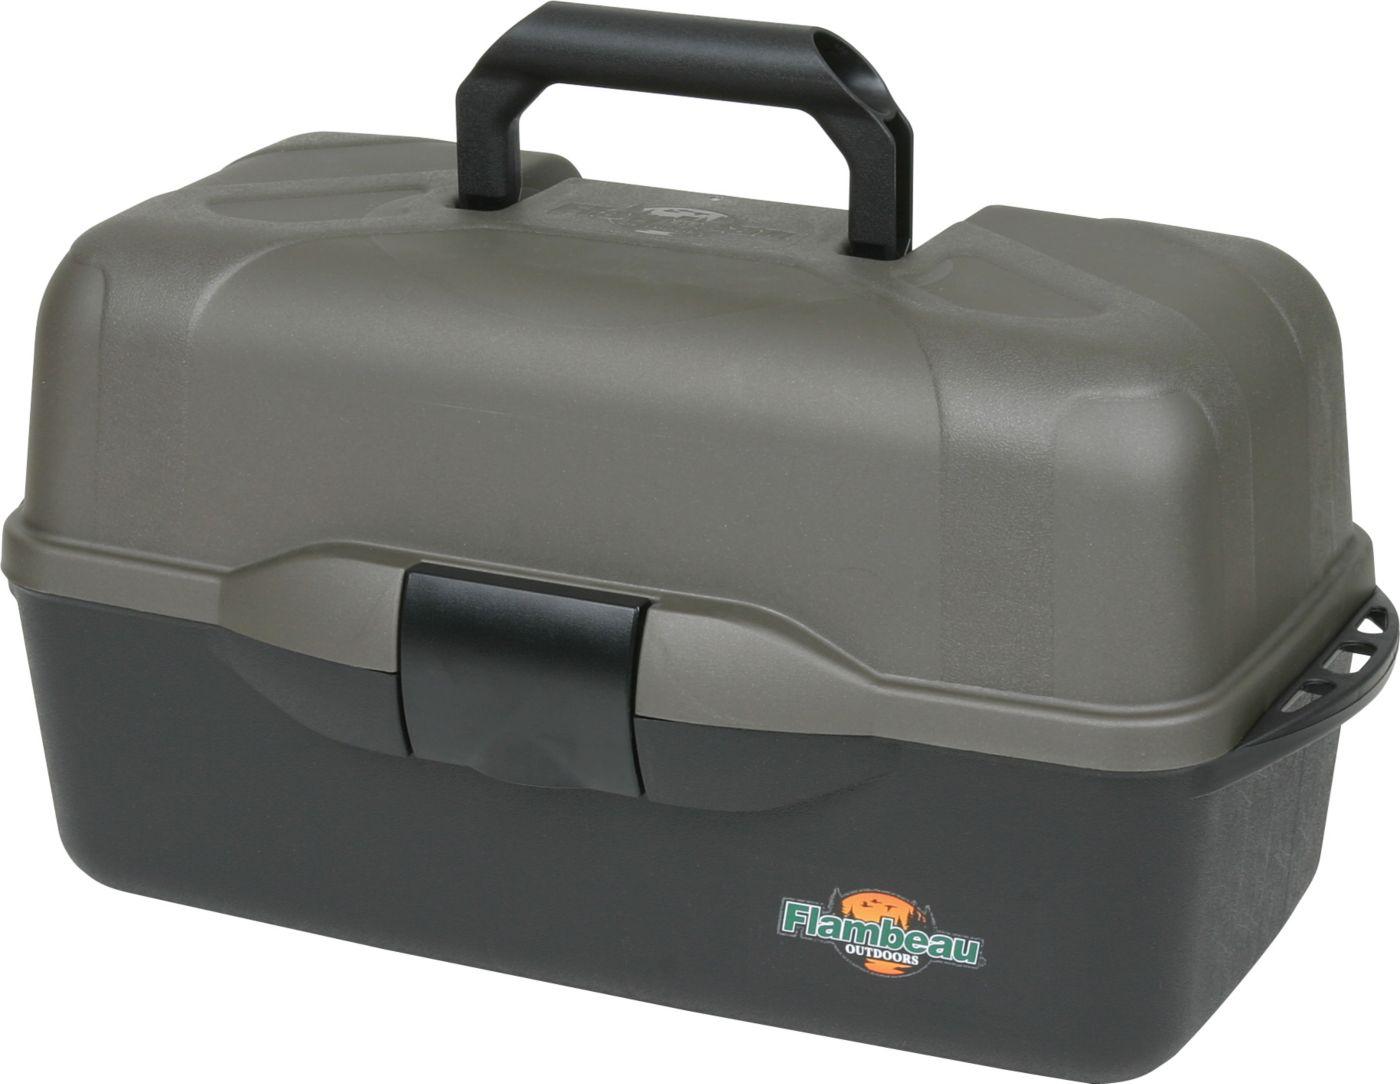 Flambeau XL 3-Tray Classic Tackle Box